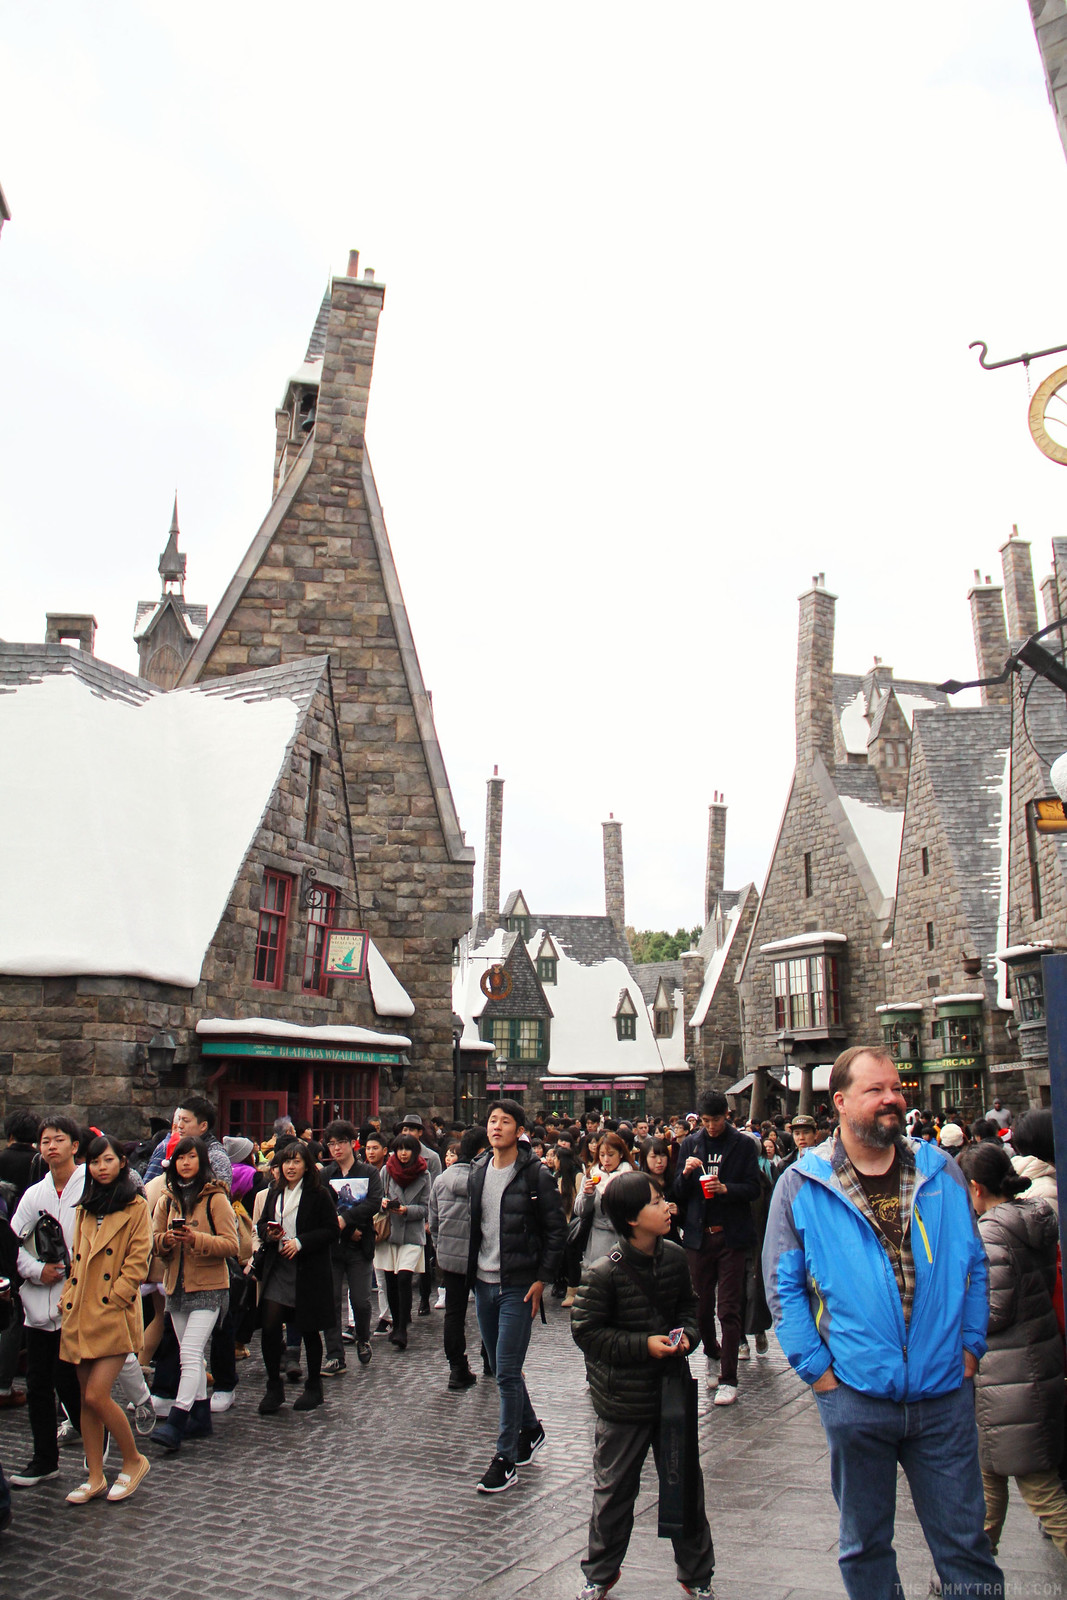 25038009499 d5751a11b0 h - {Japan Travel Diary 2015} Walking around Universal Studios Japan [VIDEO]